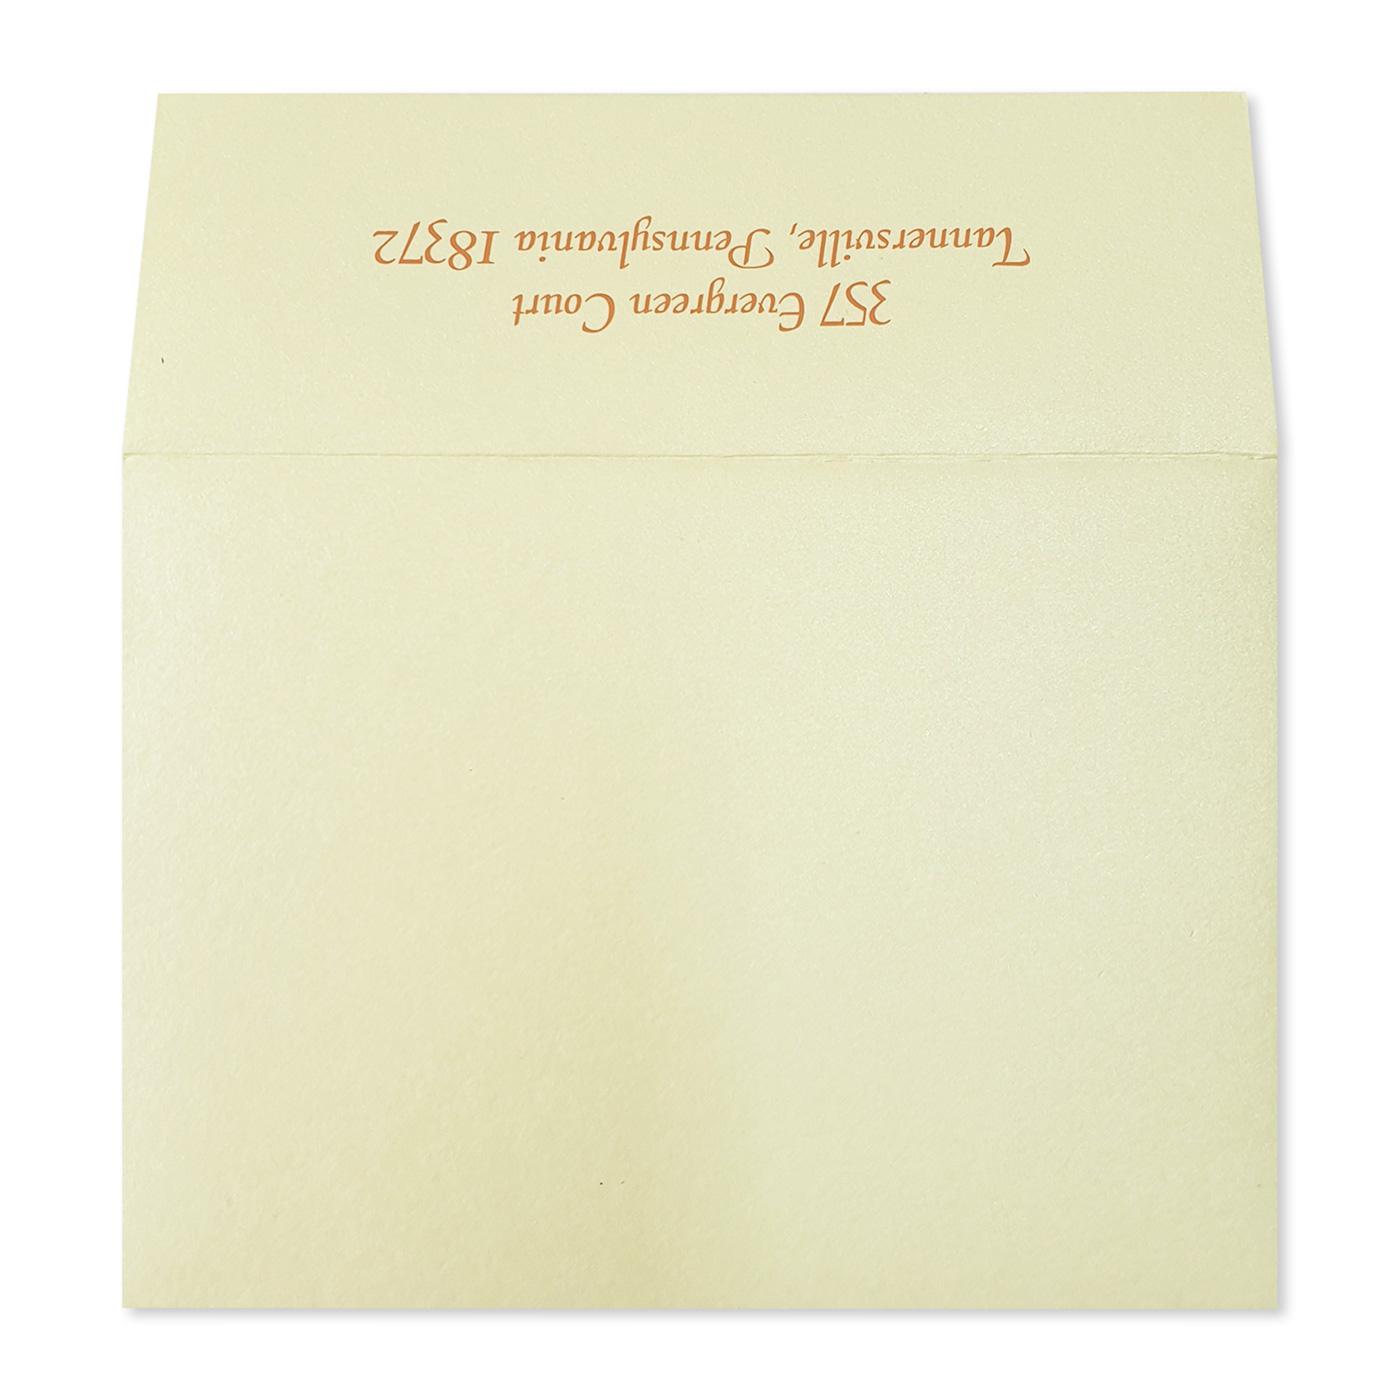 Thank You Cards : TYC-ATOMIC_TANGERINE - 123WeddingCards